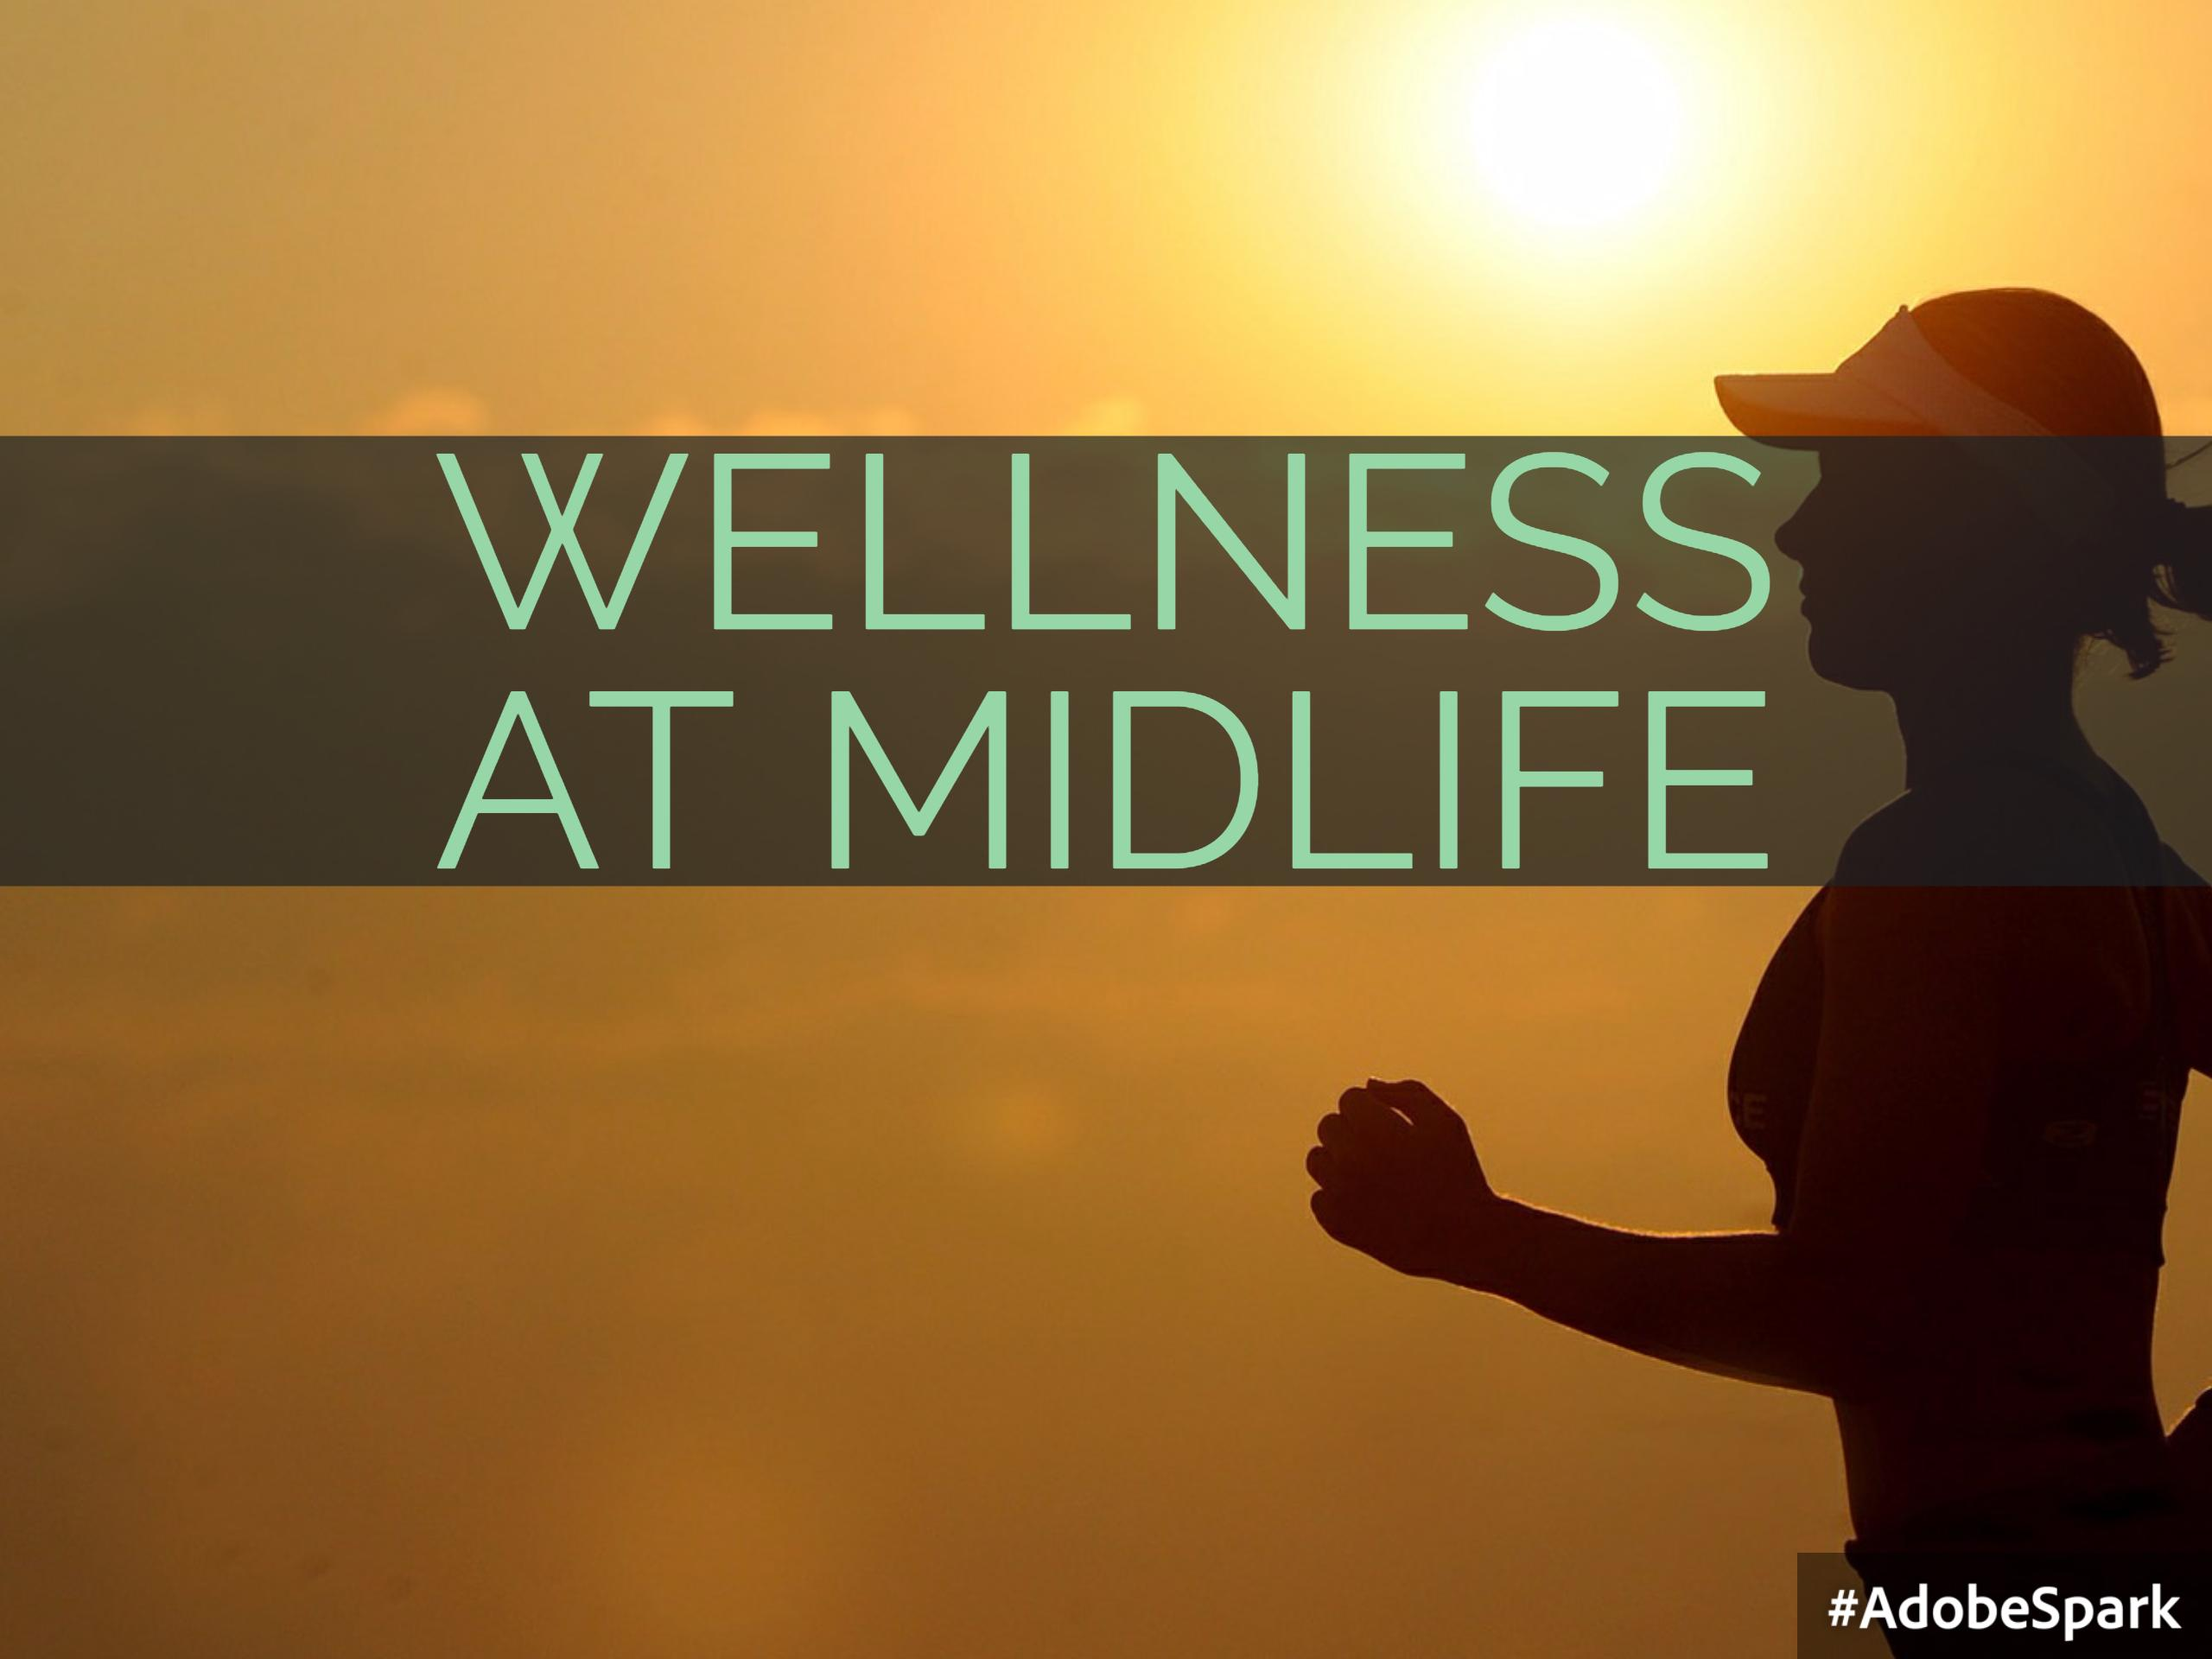 Focusing on Wellness in Midlife